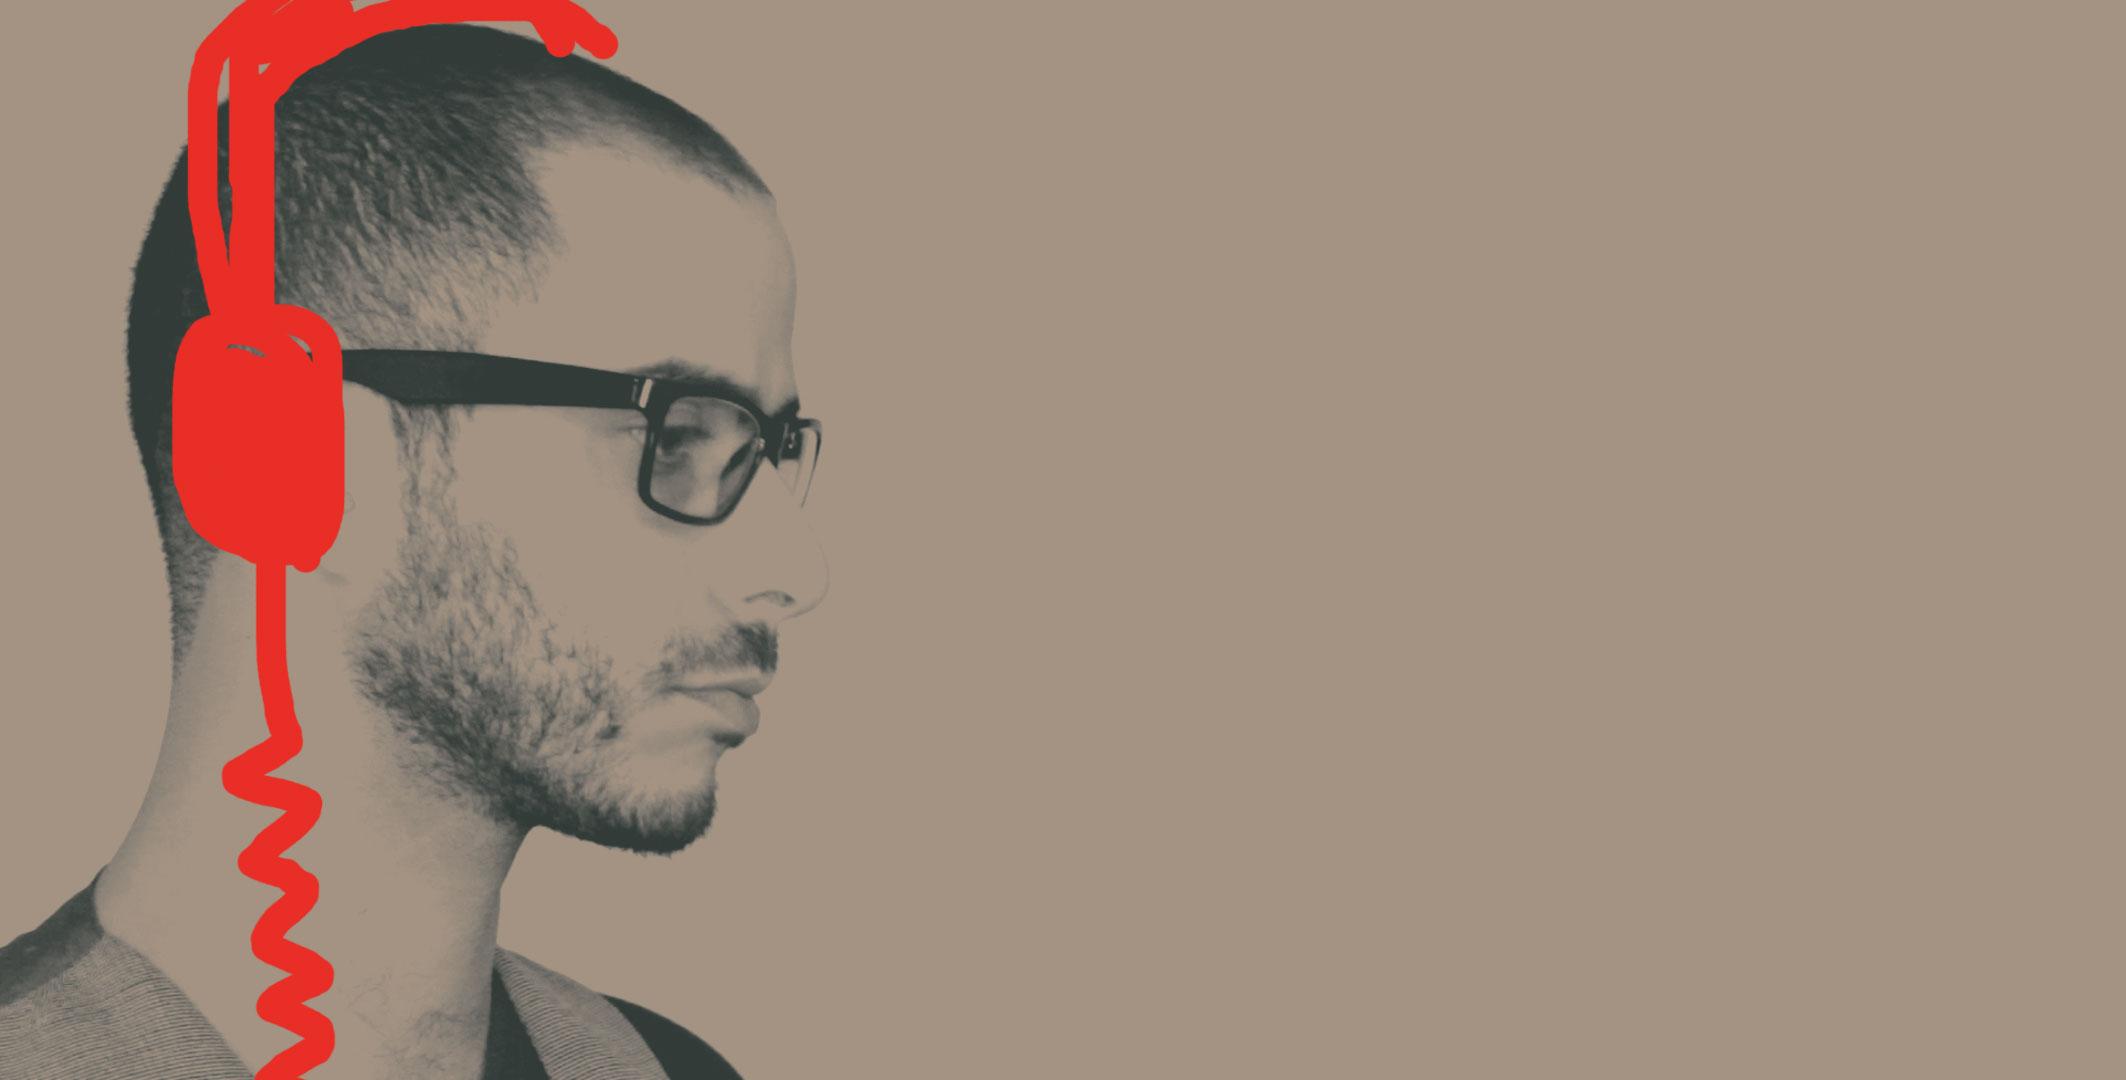 Gigs: DJ sets, July 2015, Berlin